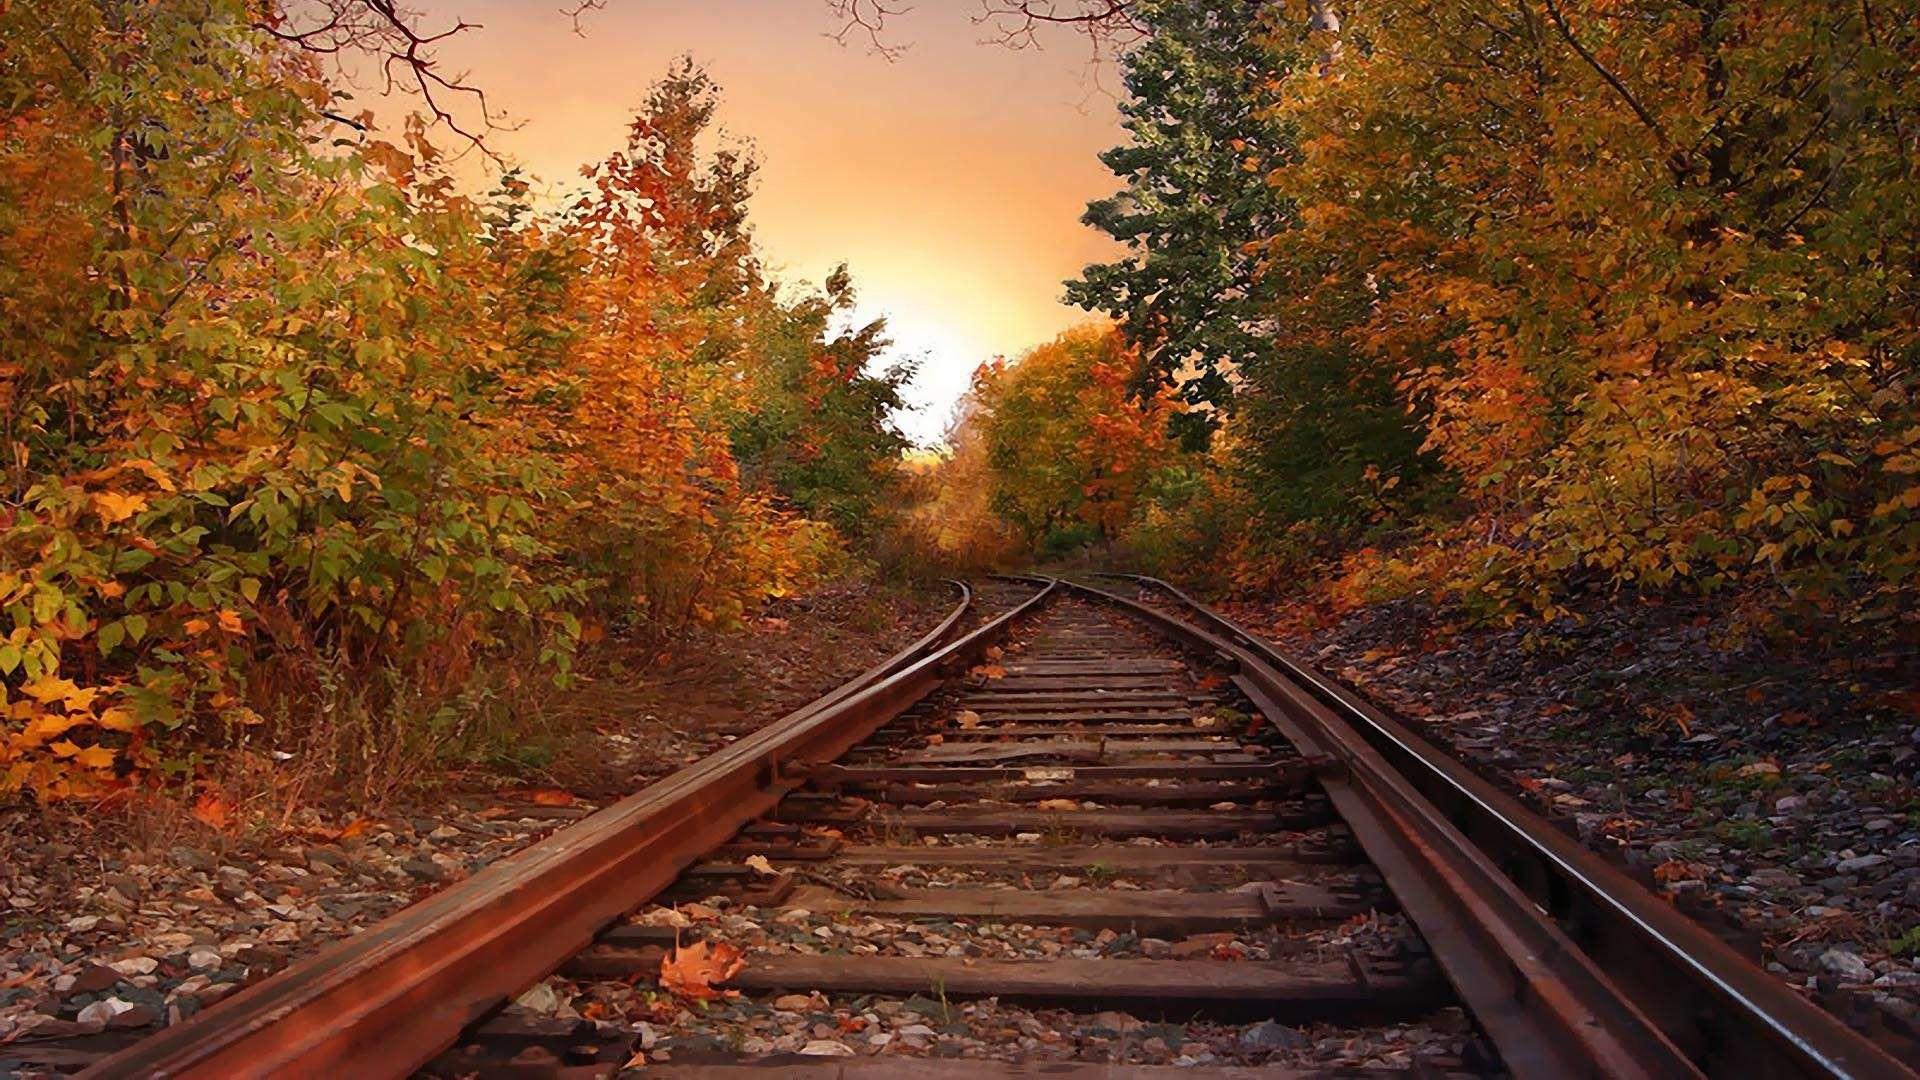 Evening Autumn Rail Hd Wallpaper Hq Backgrounds Wallpapers Autumn .